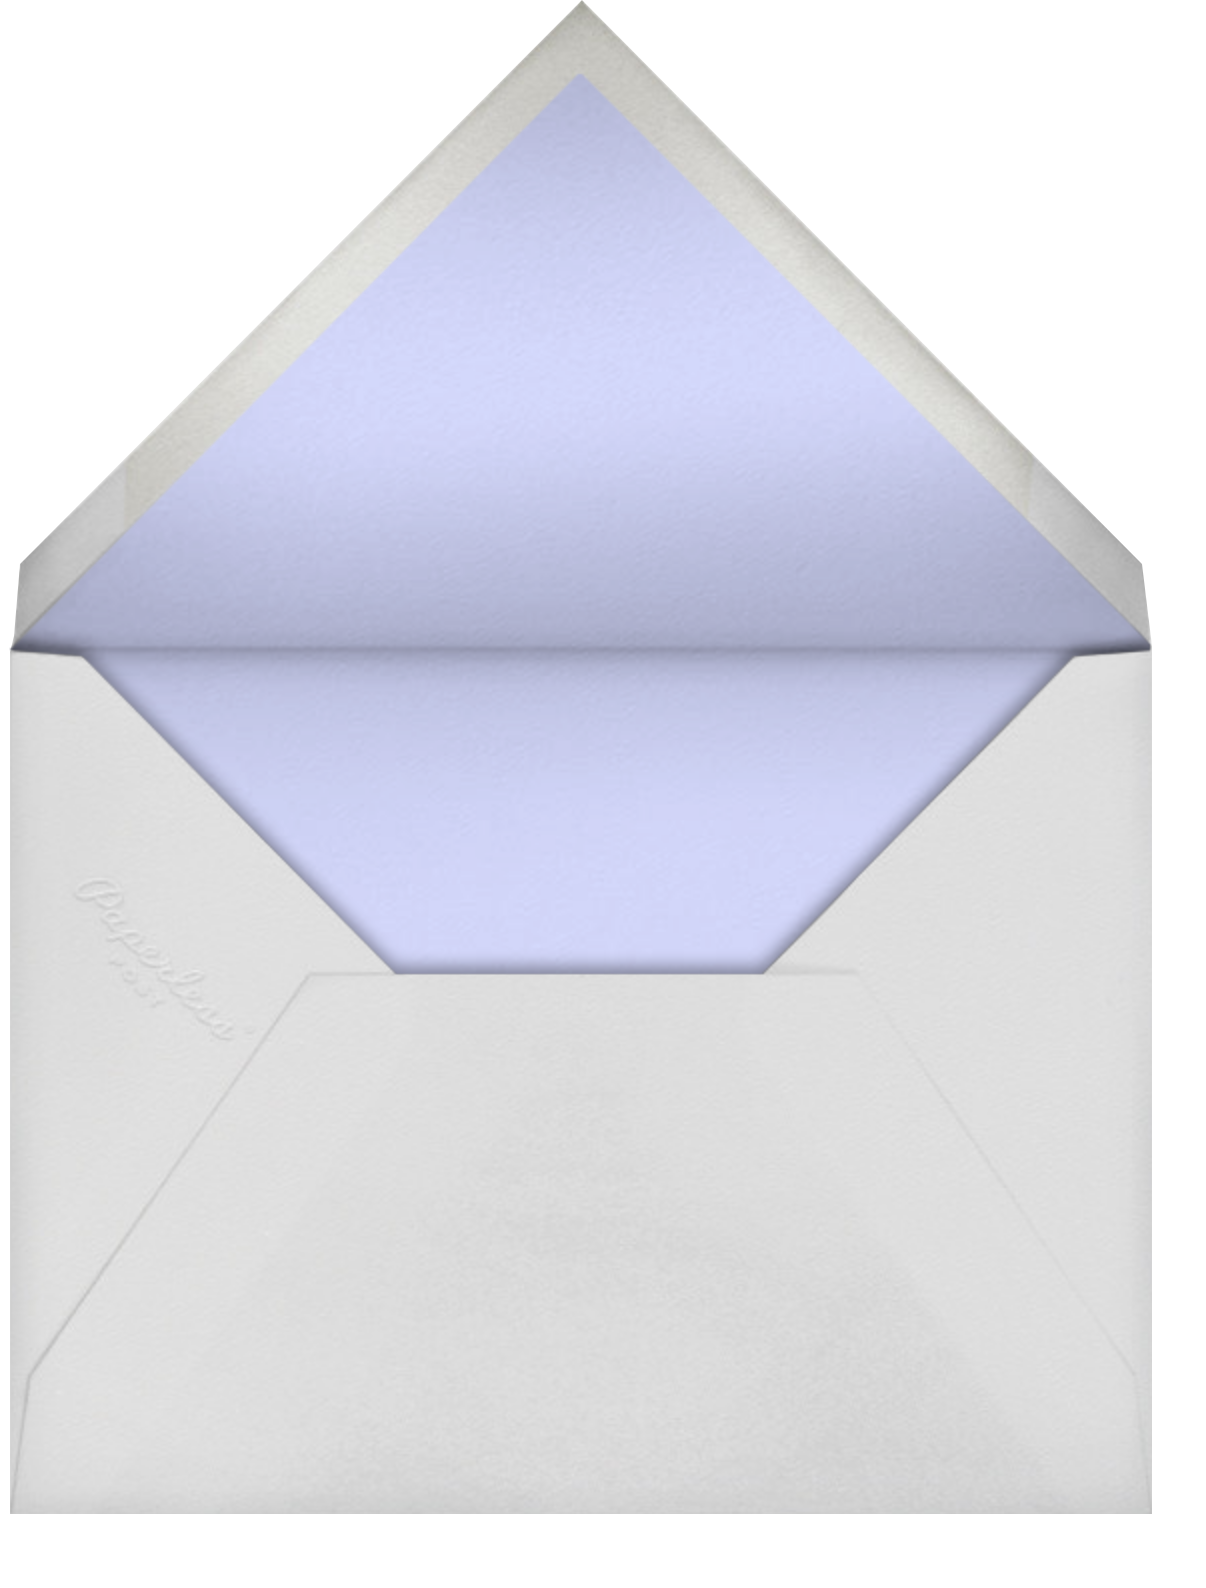 Deco Border - White - Paperless Post - Breonna Taylor birthday cards - envelope back